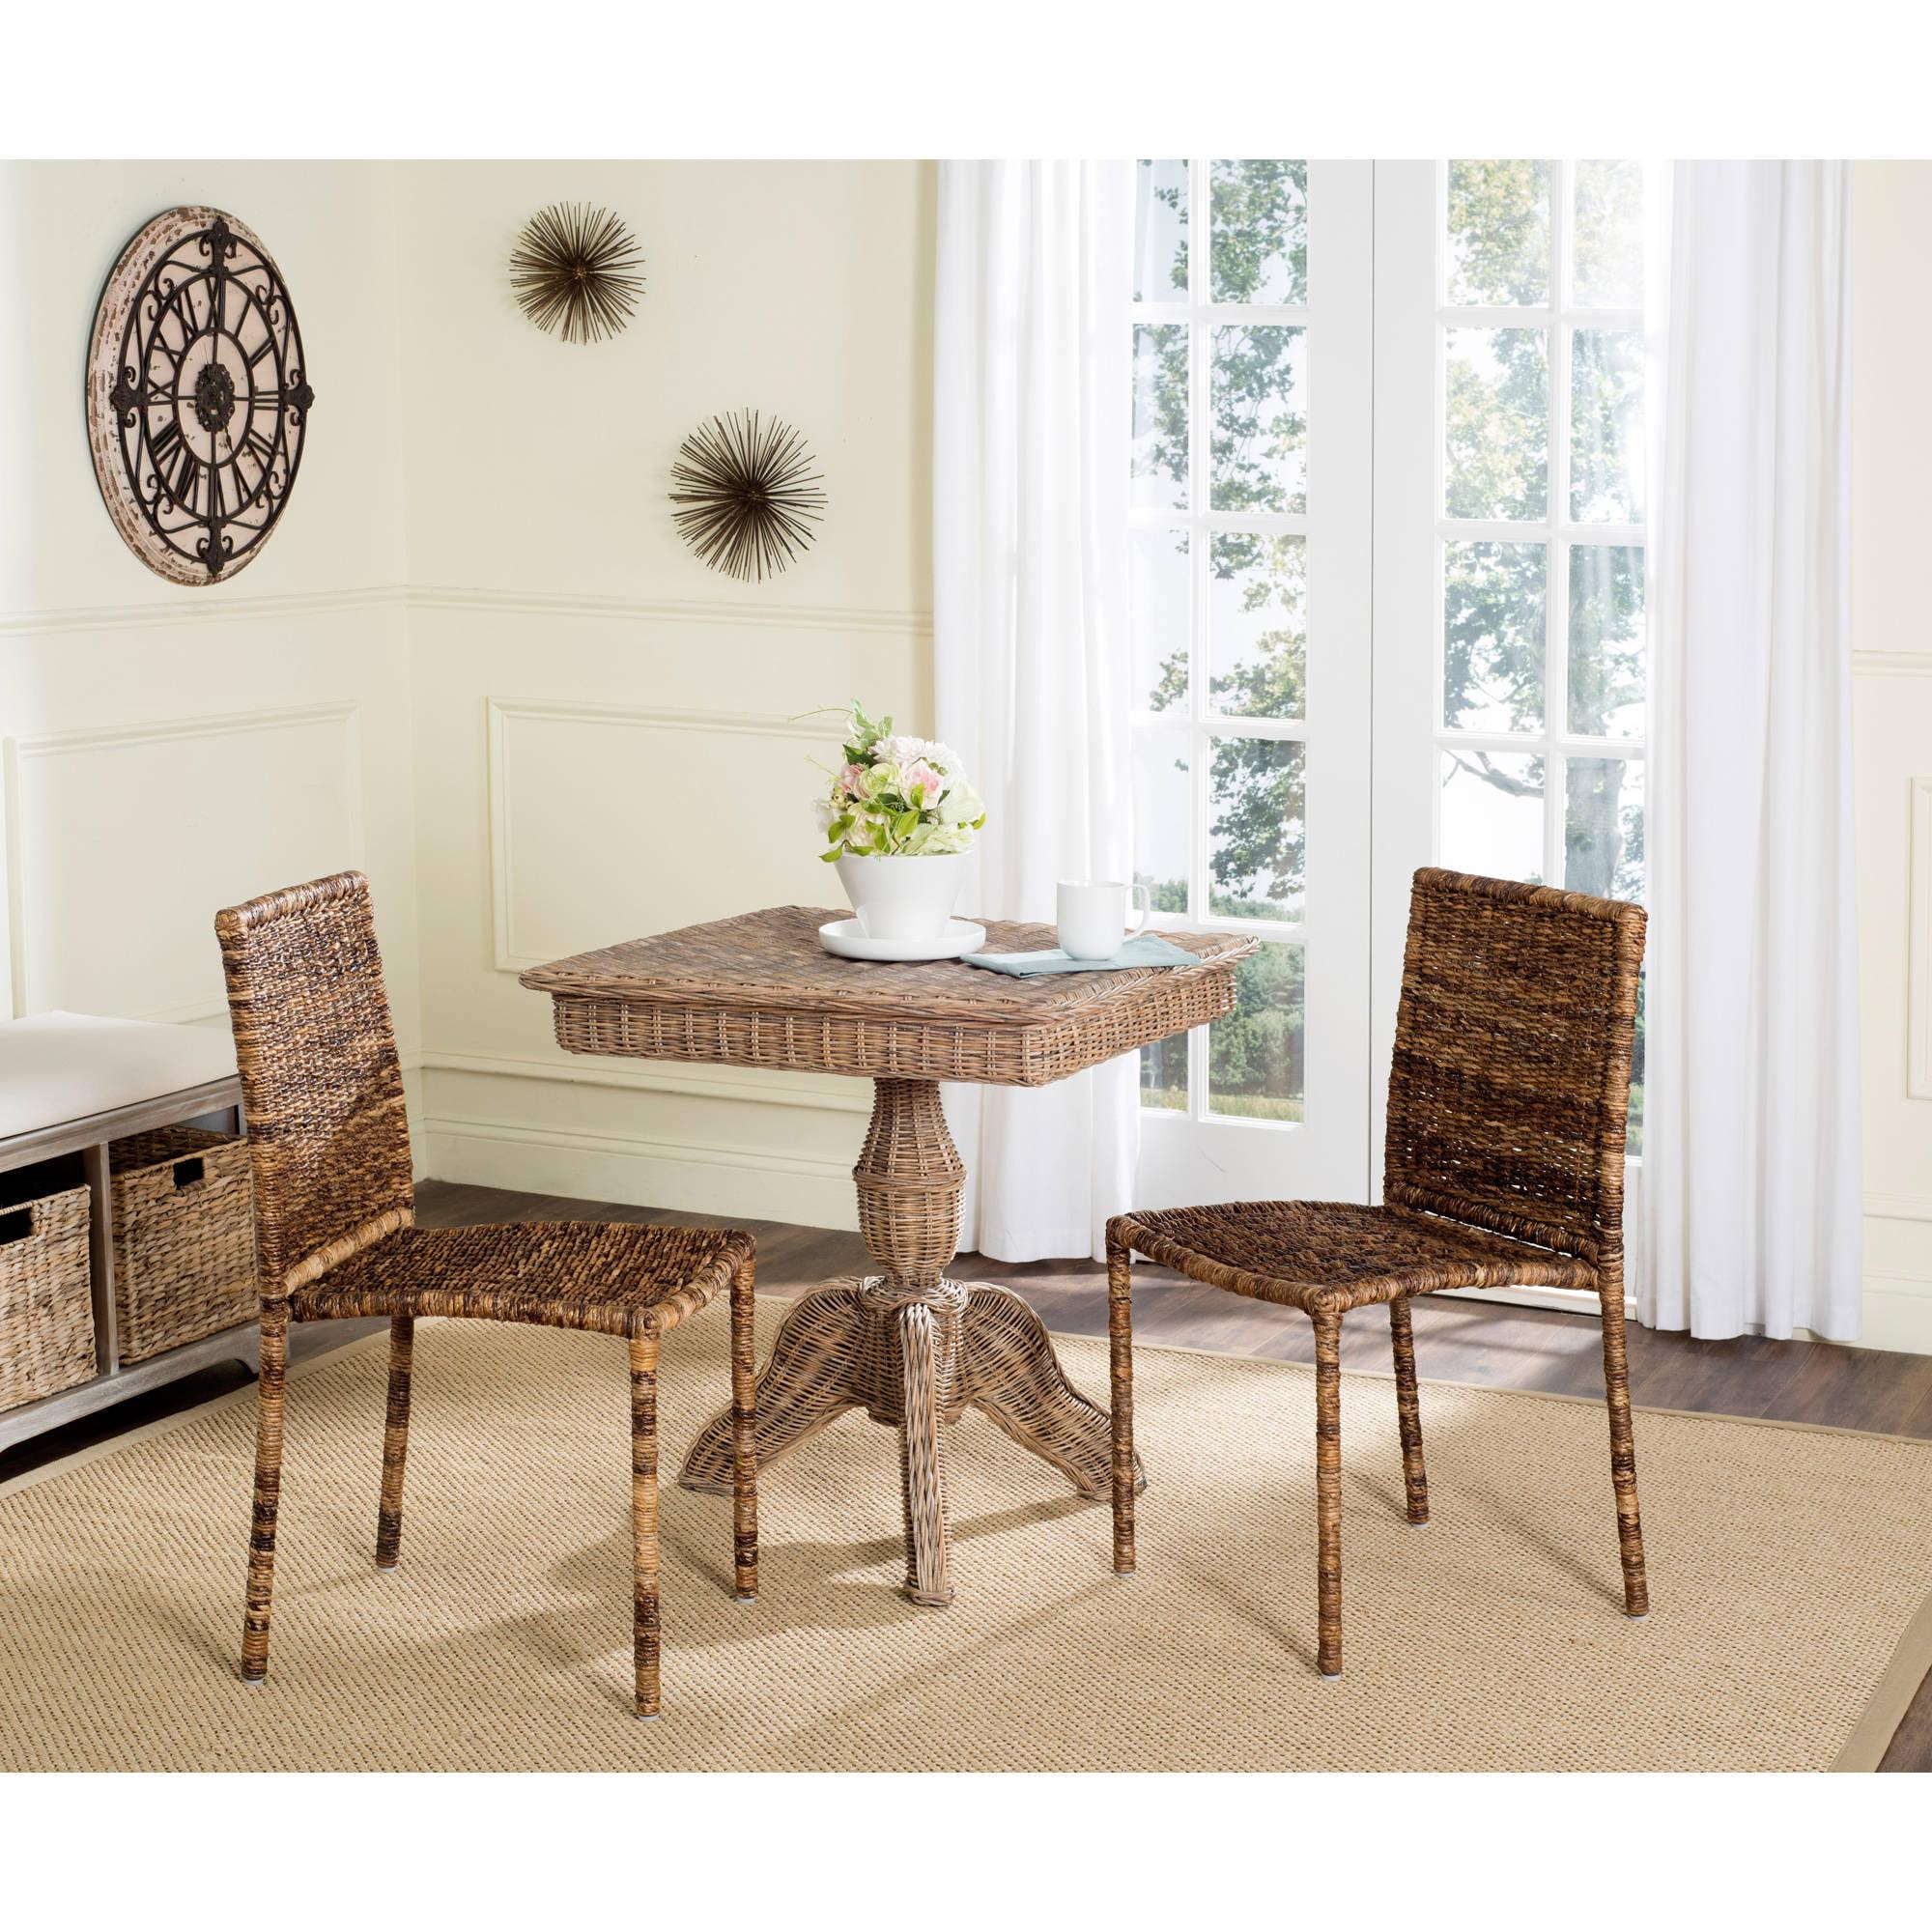 Safavieh Anra Rattan Side Chair, Brown, Set of 2 by Safavieh